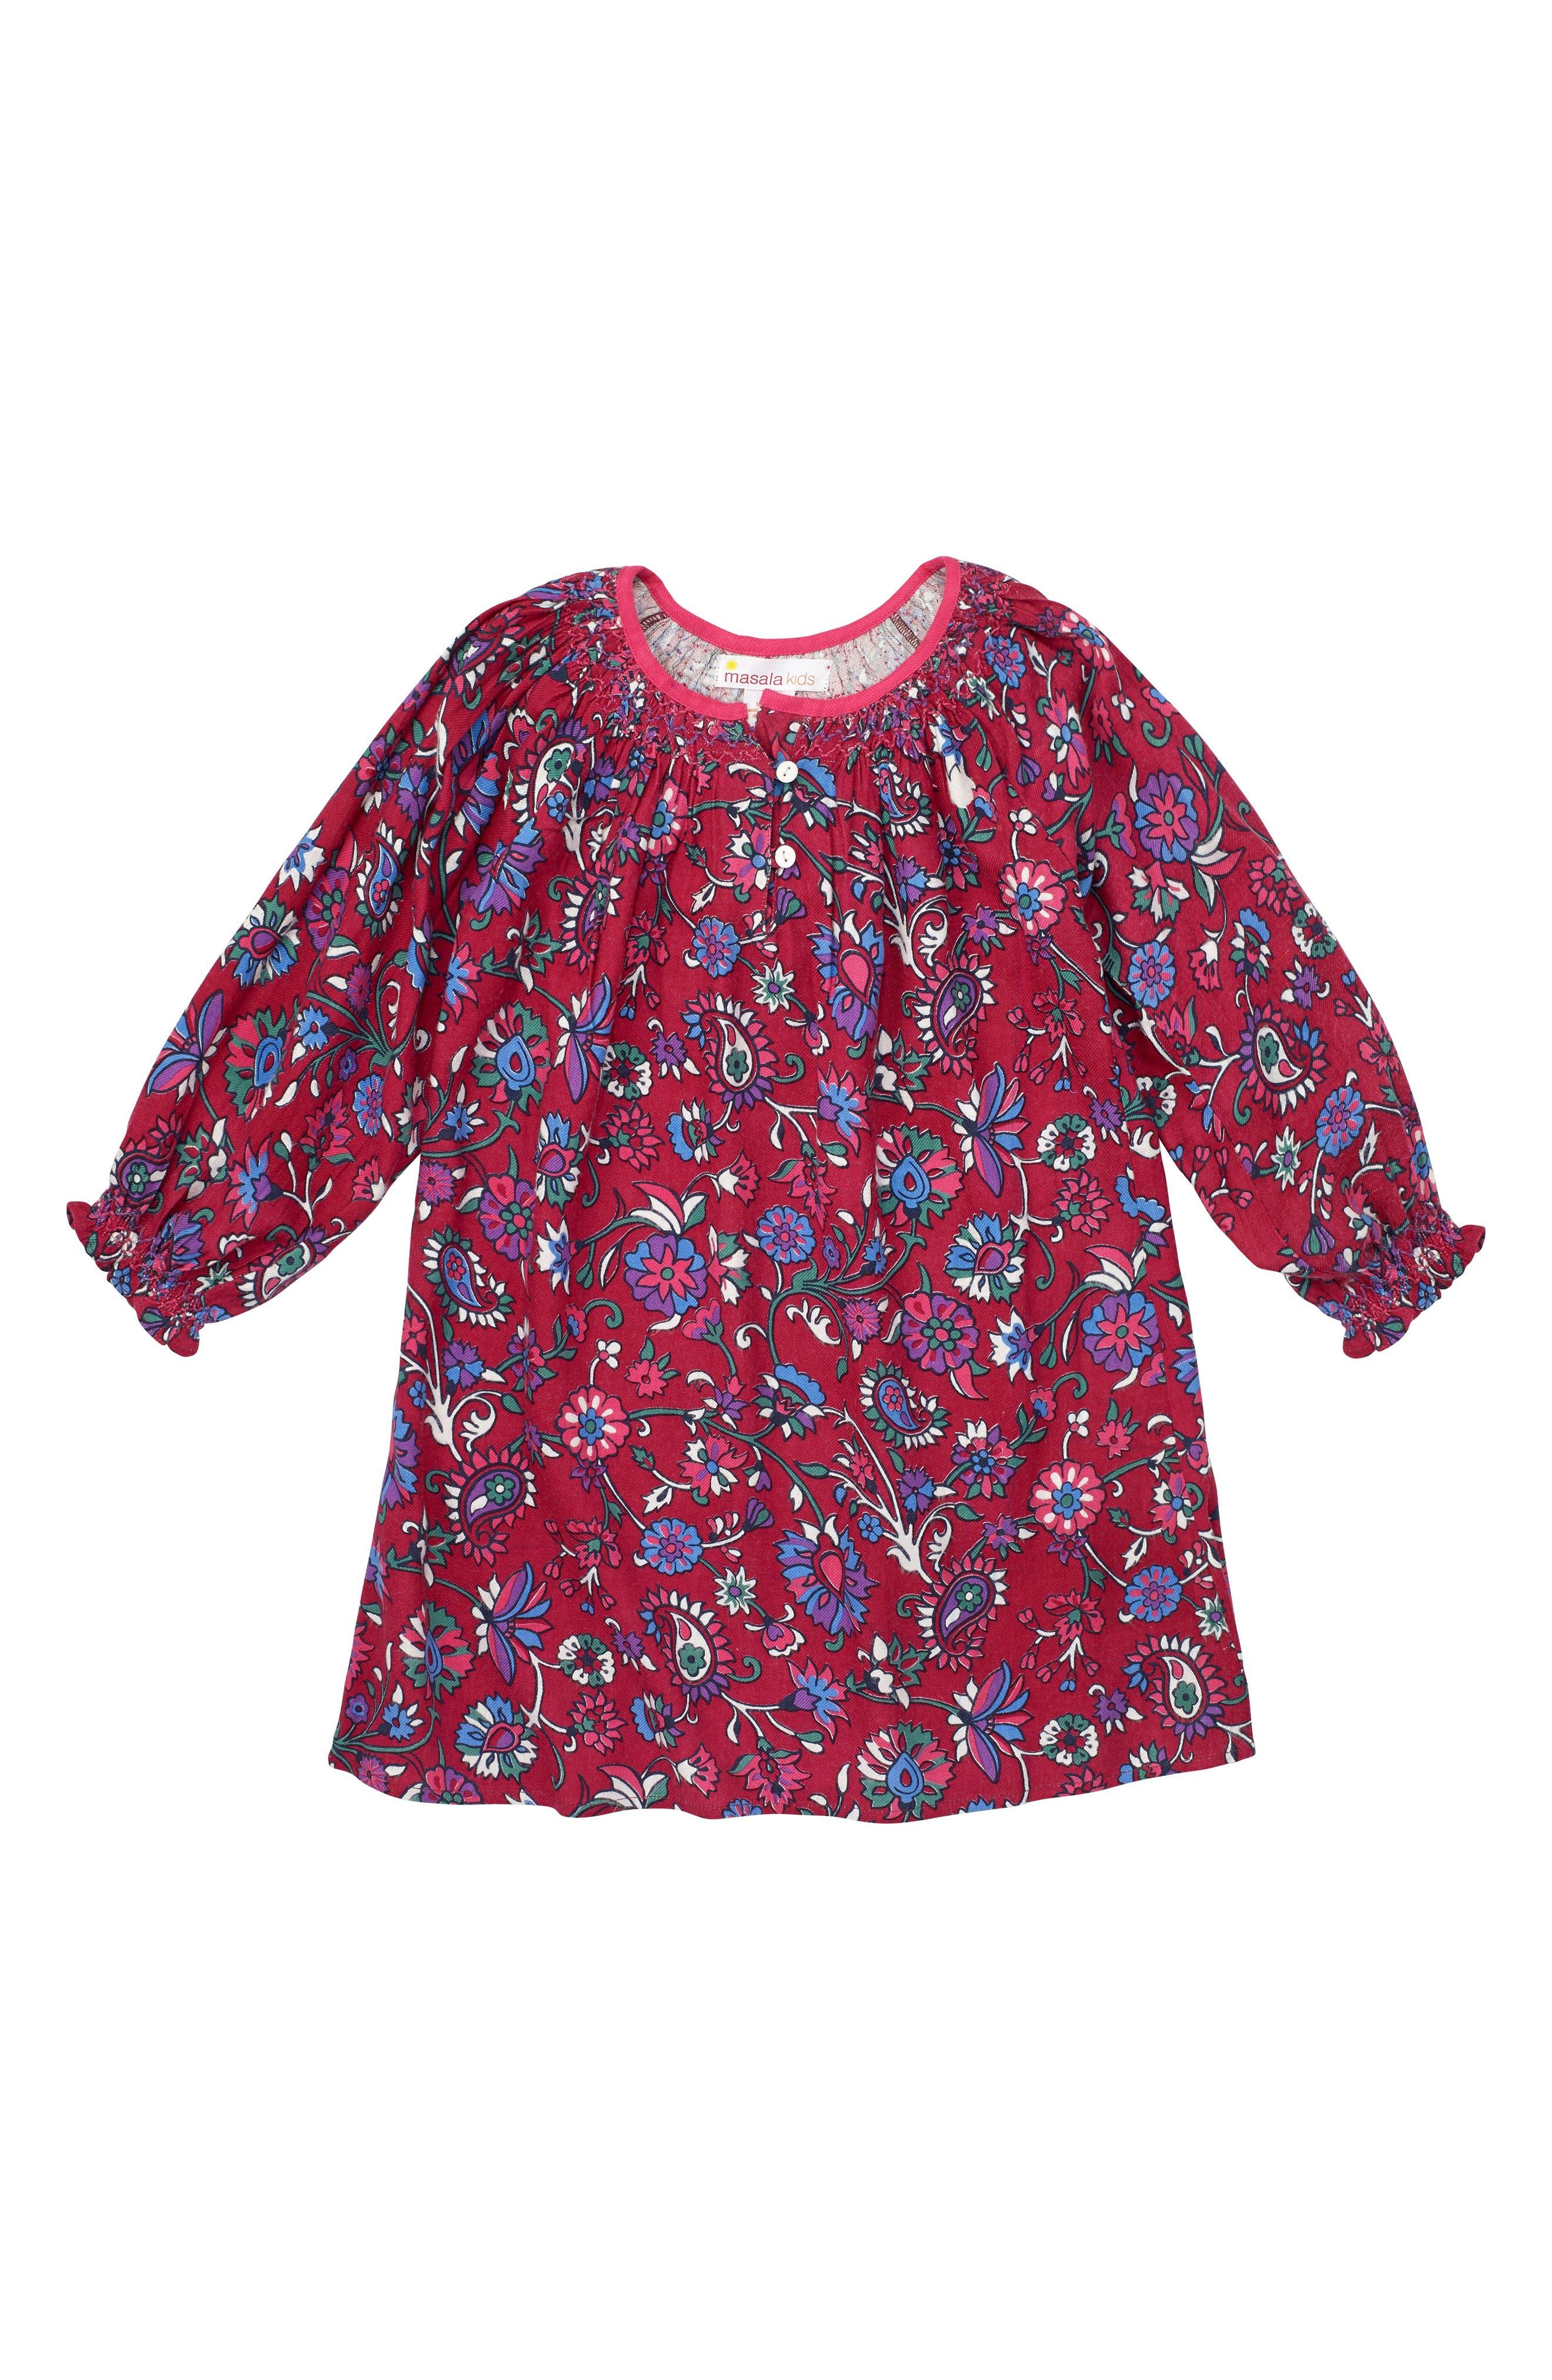 Alternate Image 1 Selected - Masalababy Ada Floral Dress (Toddler Girls, Little Girls & Big Girls)